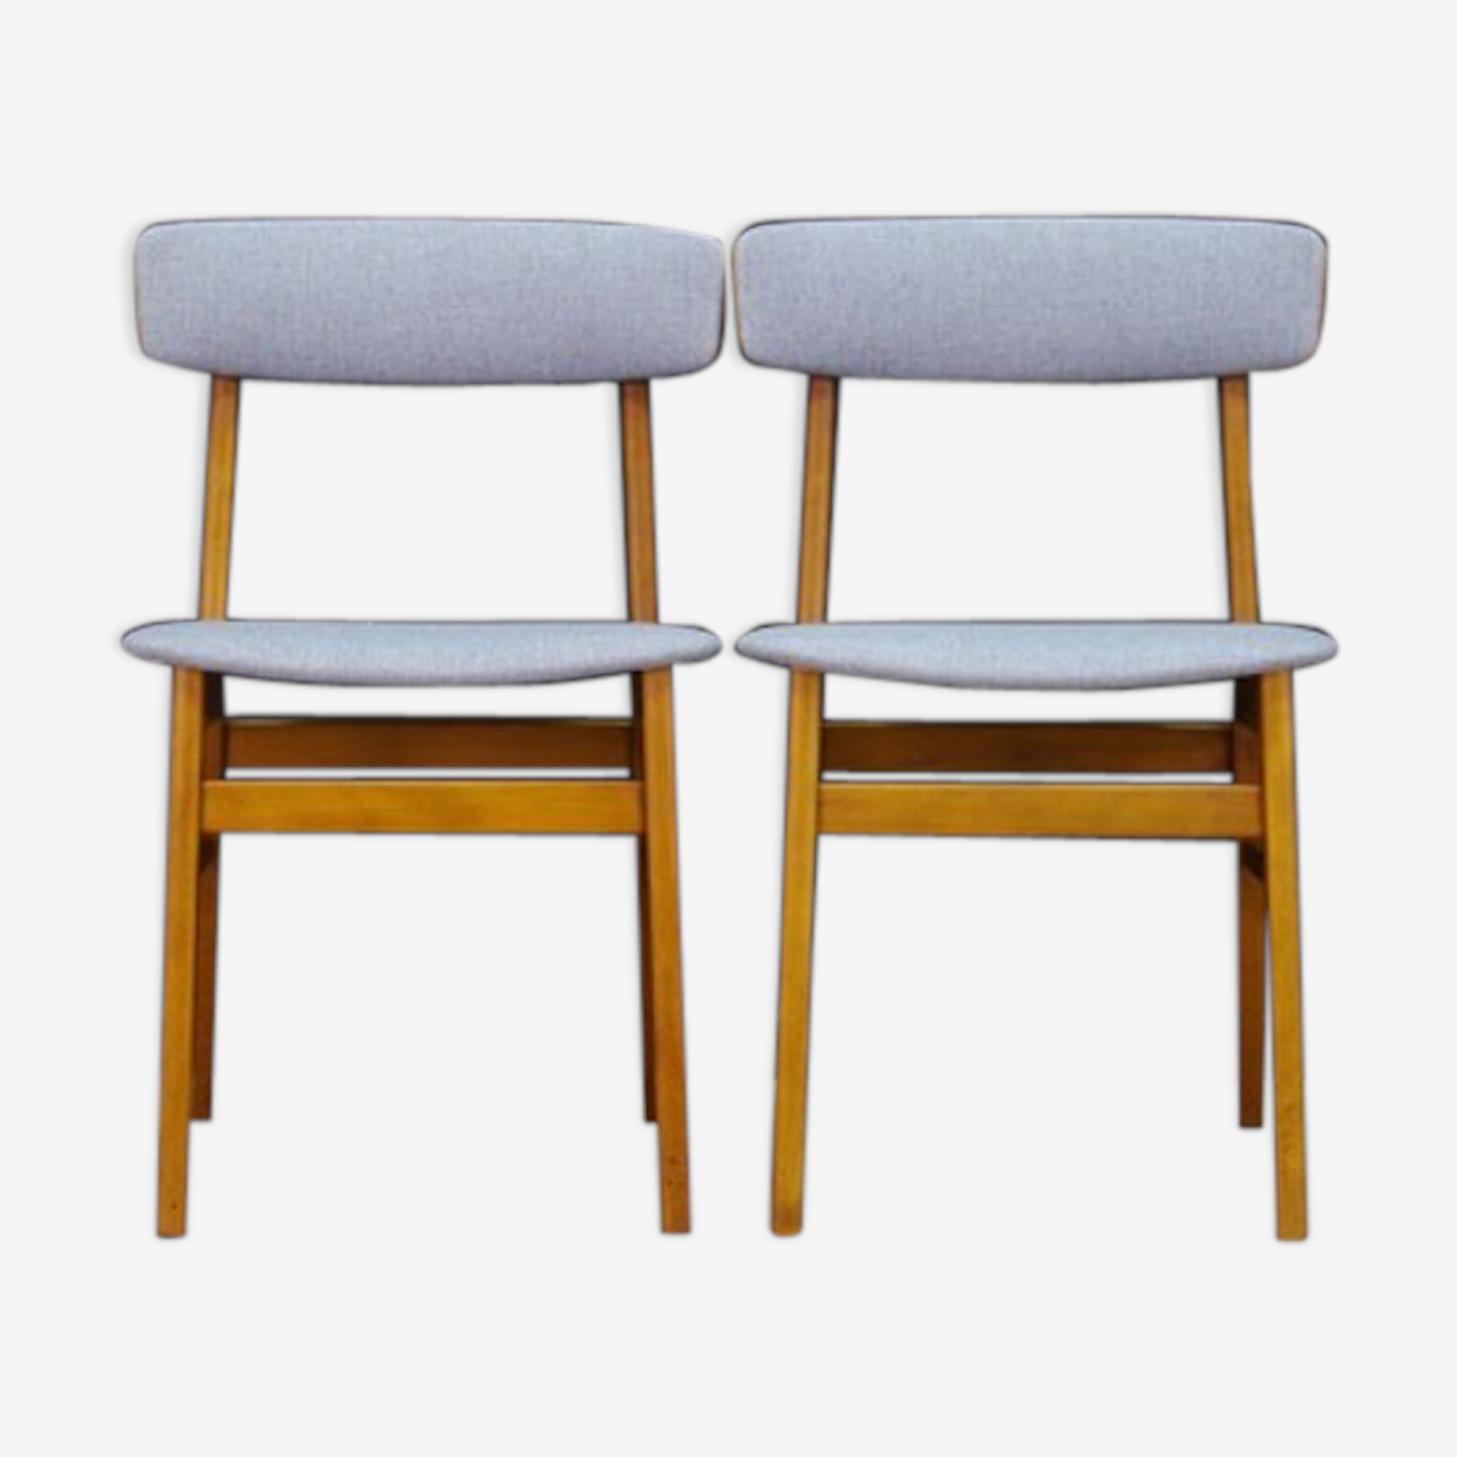 Chaises Farstrup design danois design